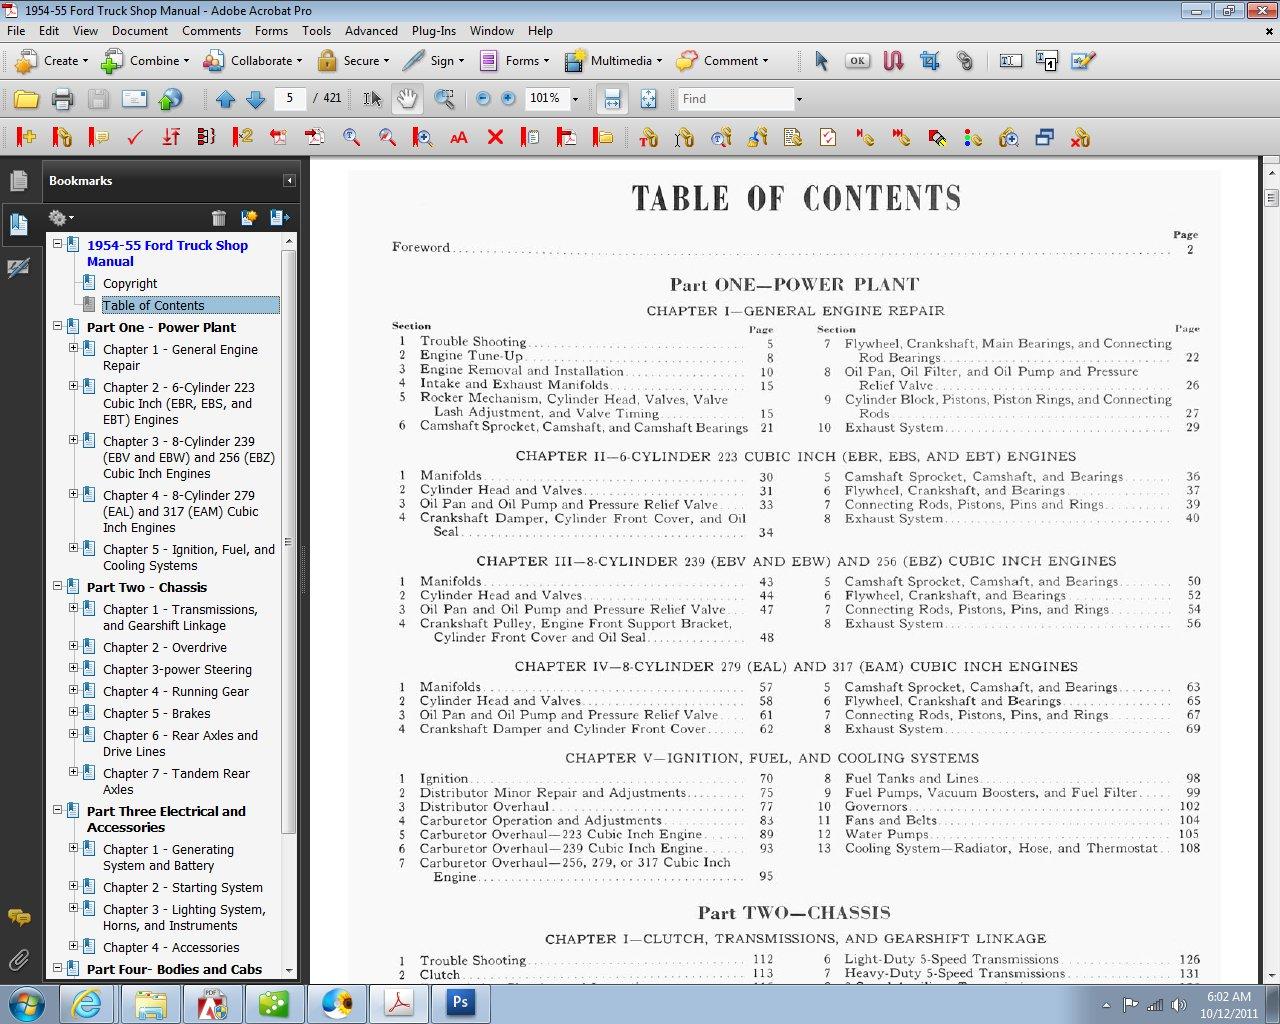 1954 55 Ford Truck Shop Manual Motor Company David E Leblanc Problems With 3 7 Engine 9781603710640 Books